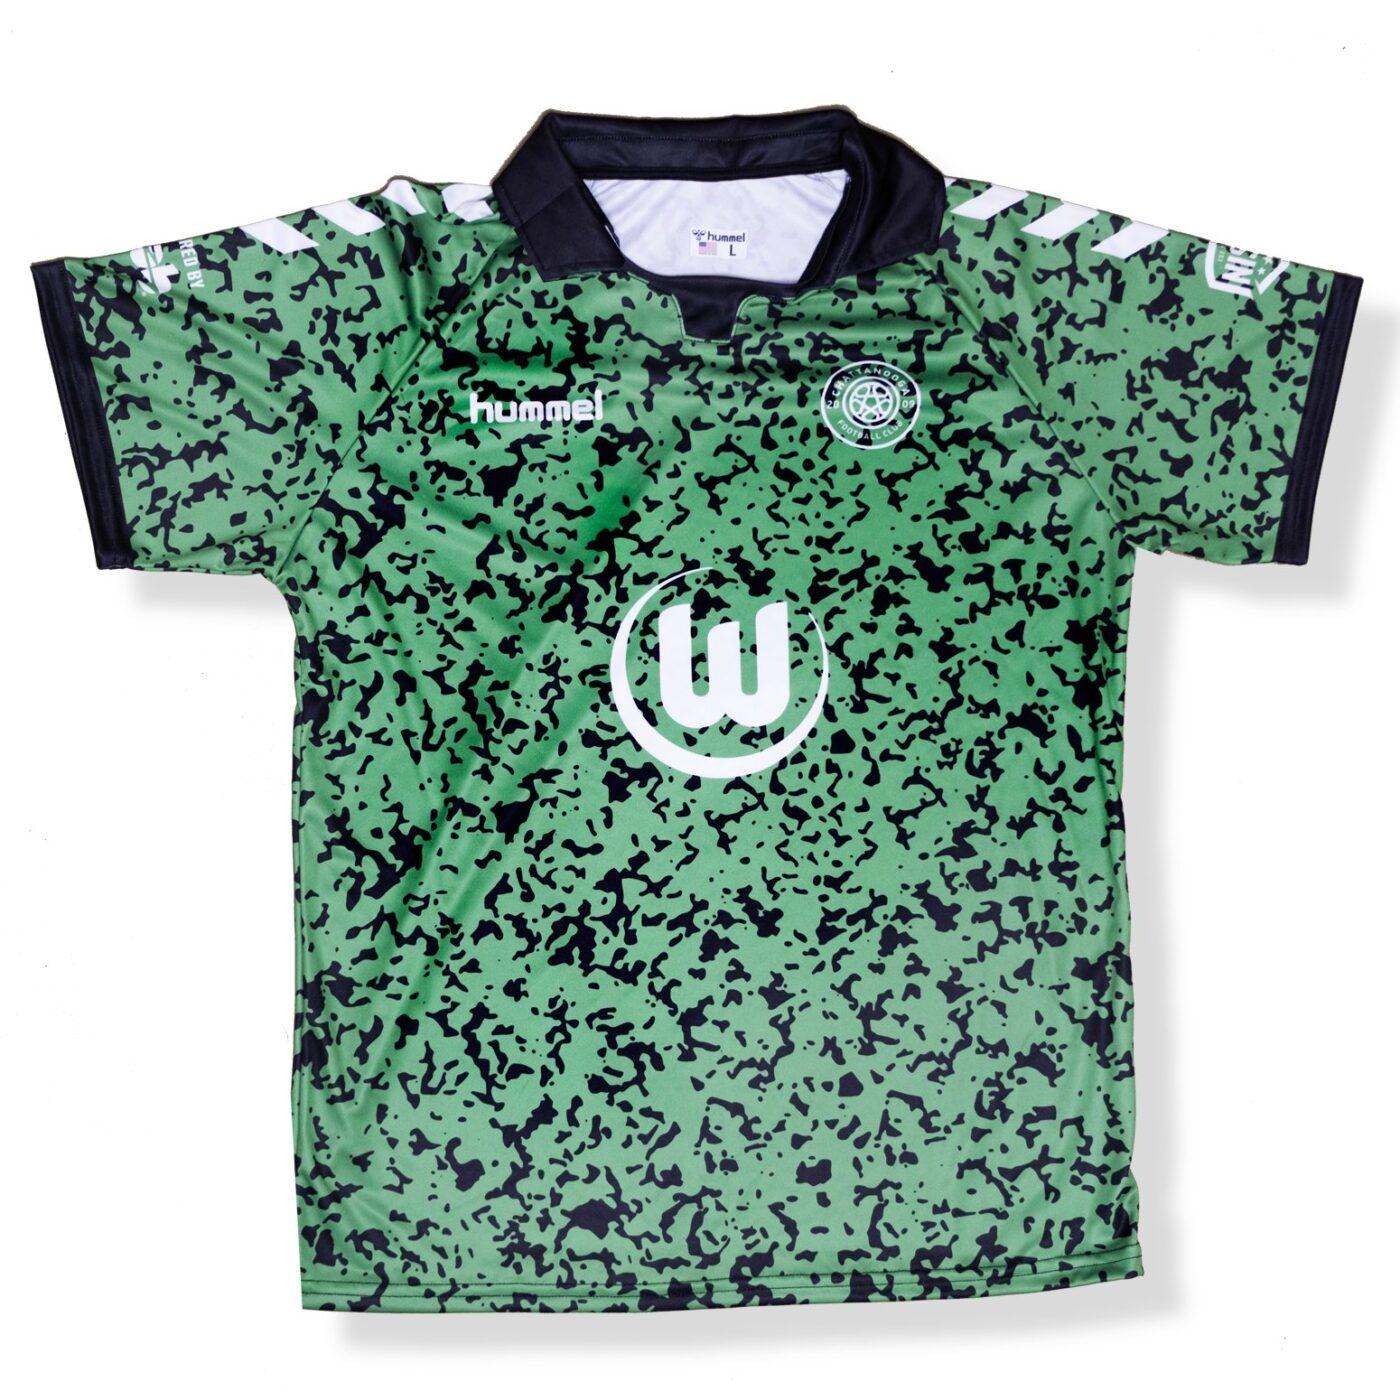 Maillot Chattanooga sponsor VfL Wolfsbourg